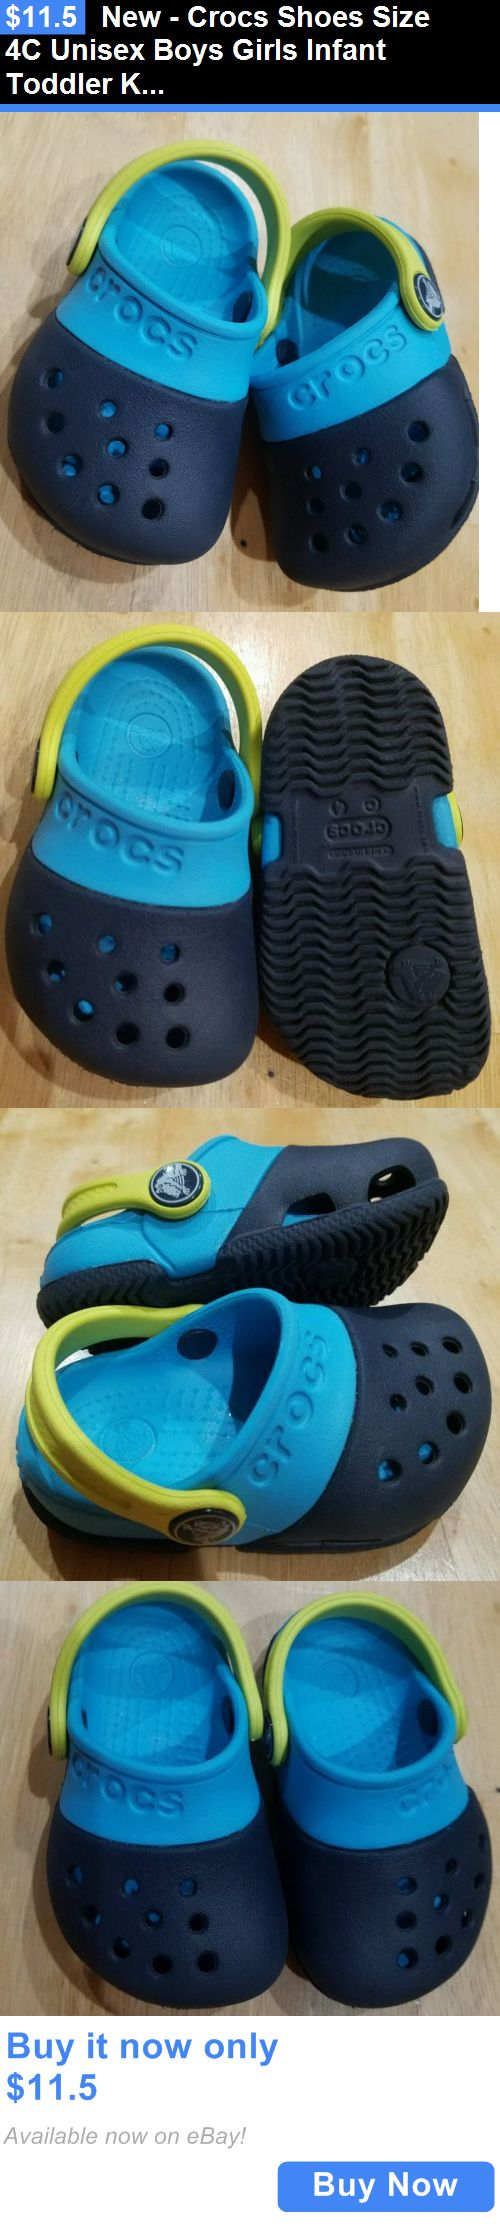 Baby Boy Shoes New Crocs Shoes Size 4c Unisex Boys Girls Infant